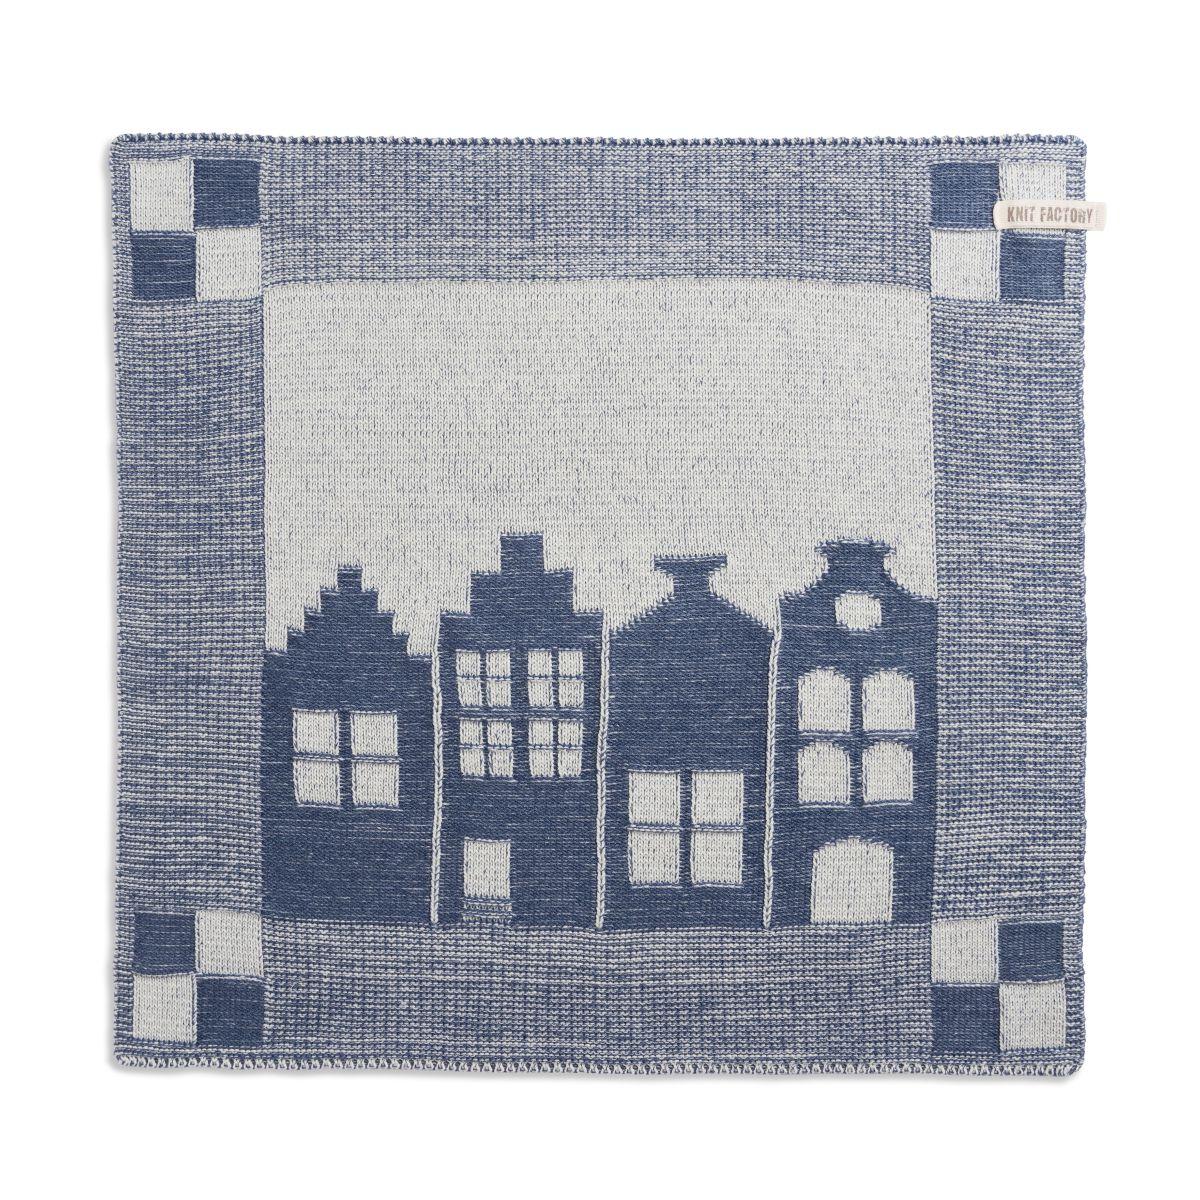 knit factory 2070077 keukendoek huis ecru jeans